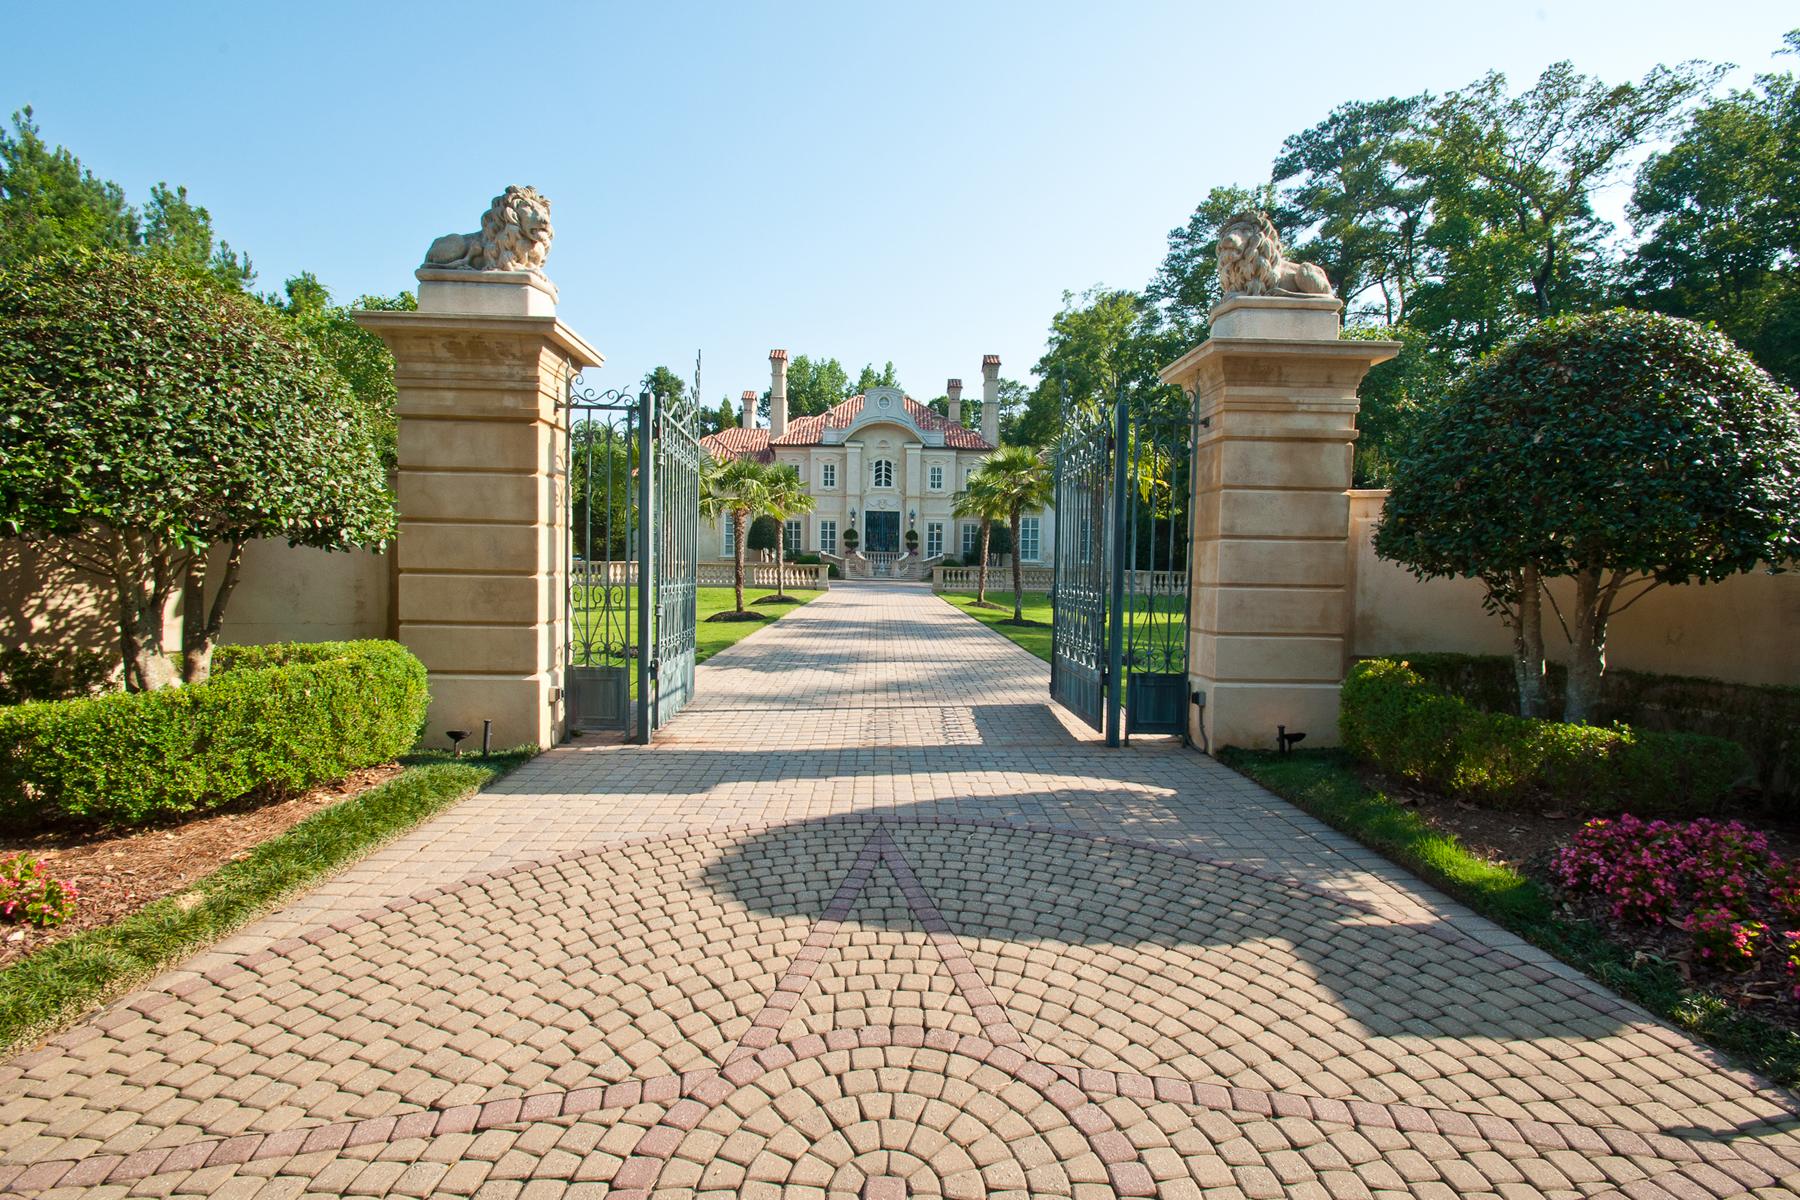 Casa para uma família para Venda às Magnificent Mediterranean Estate 4670 Northside Drive North Buckhead, Atlanta, Geórgia, 30327 Estados Unidos